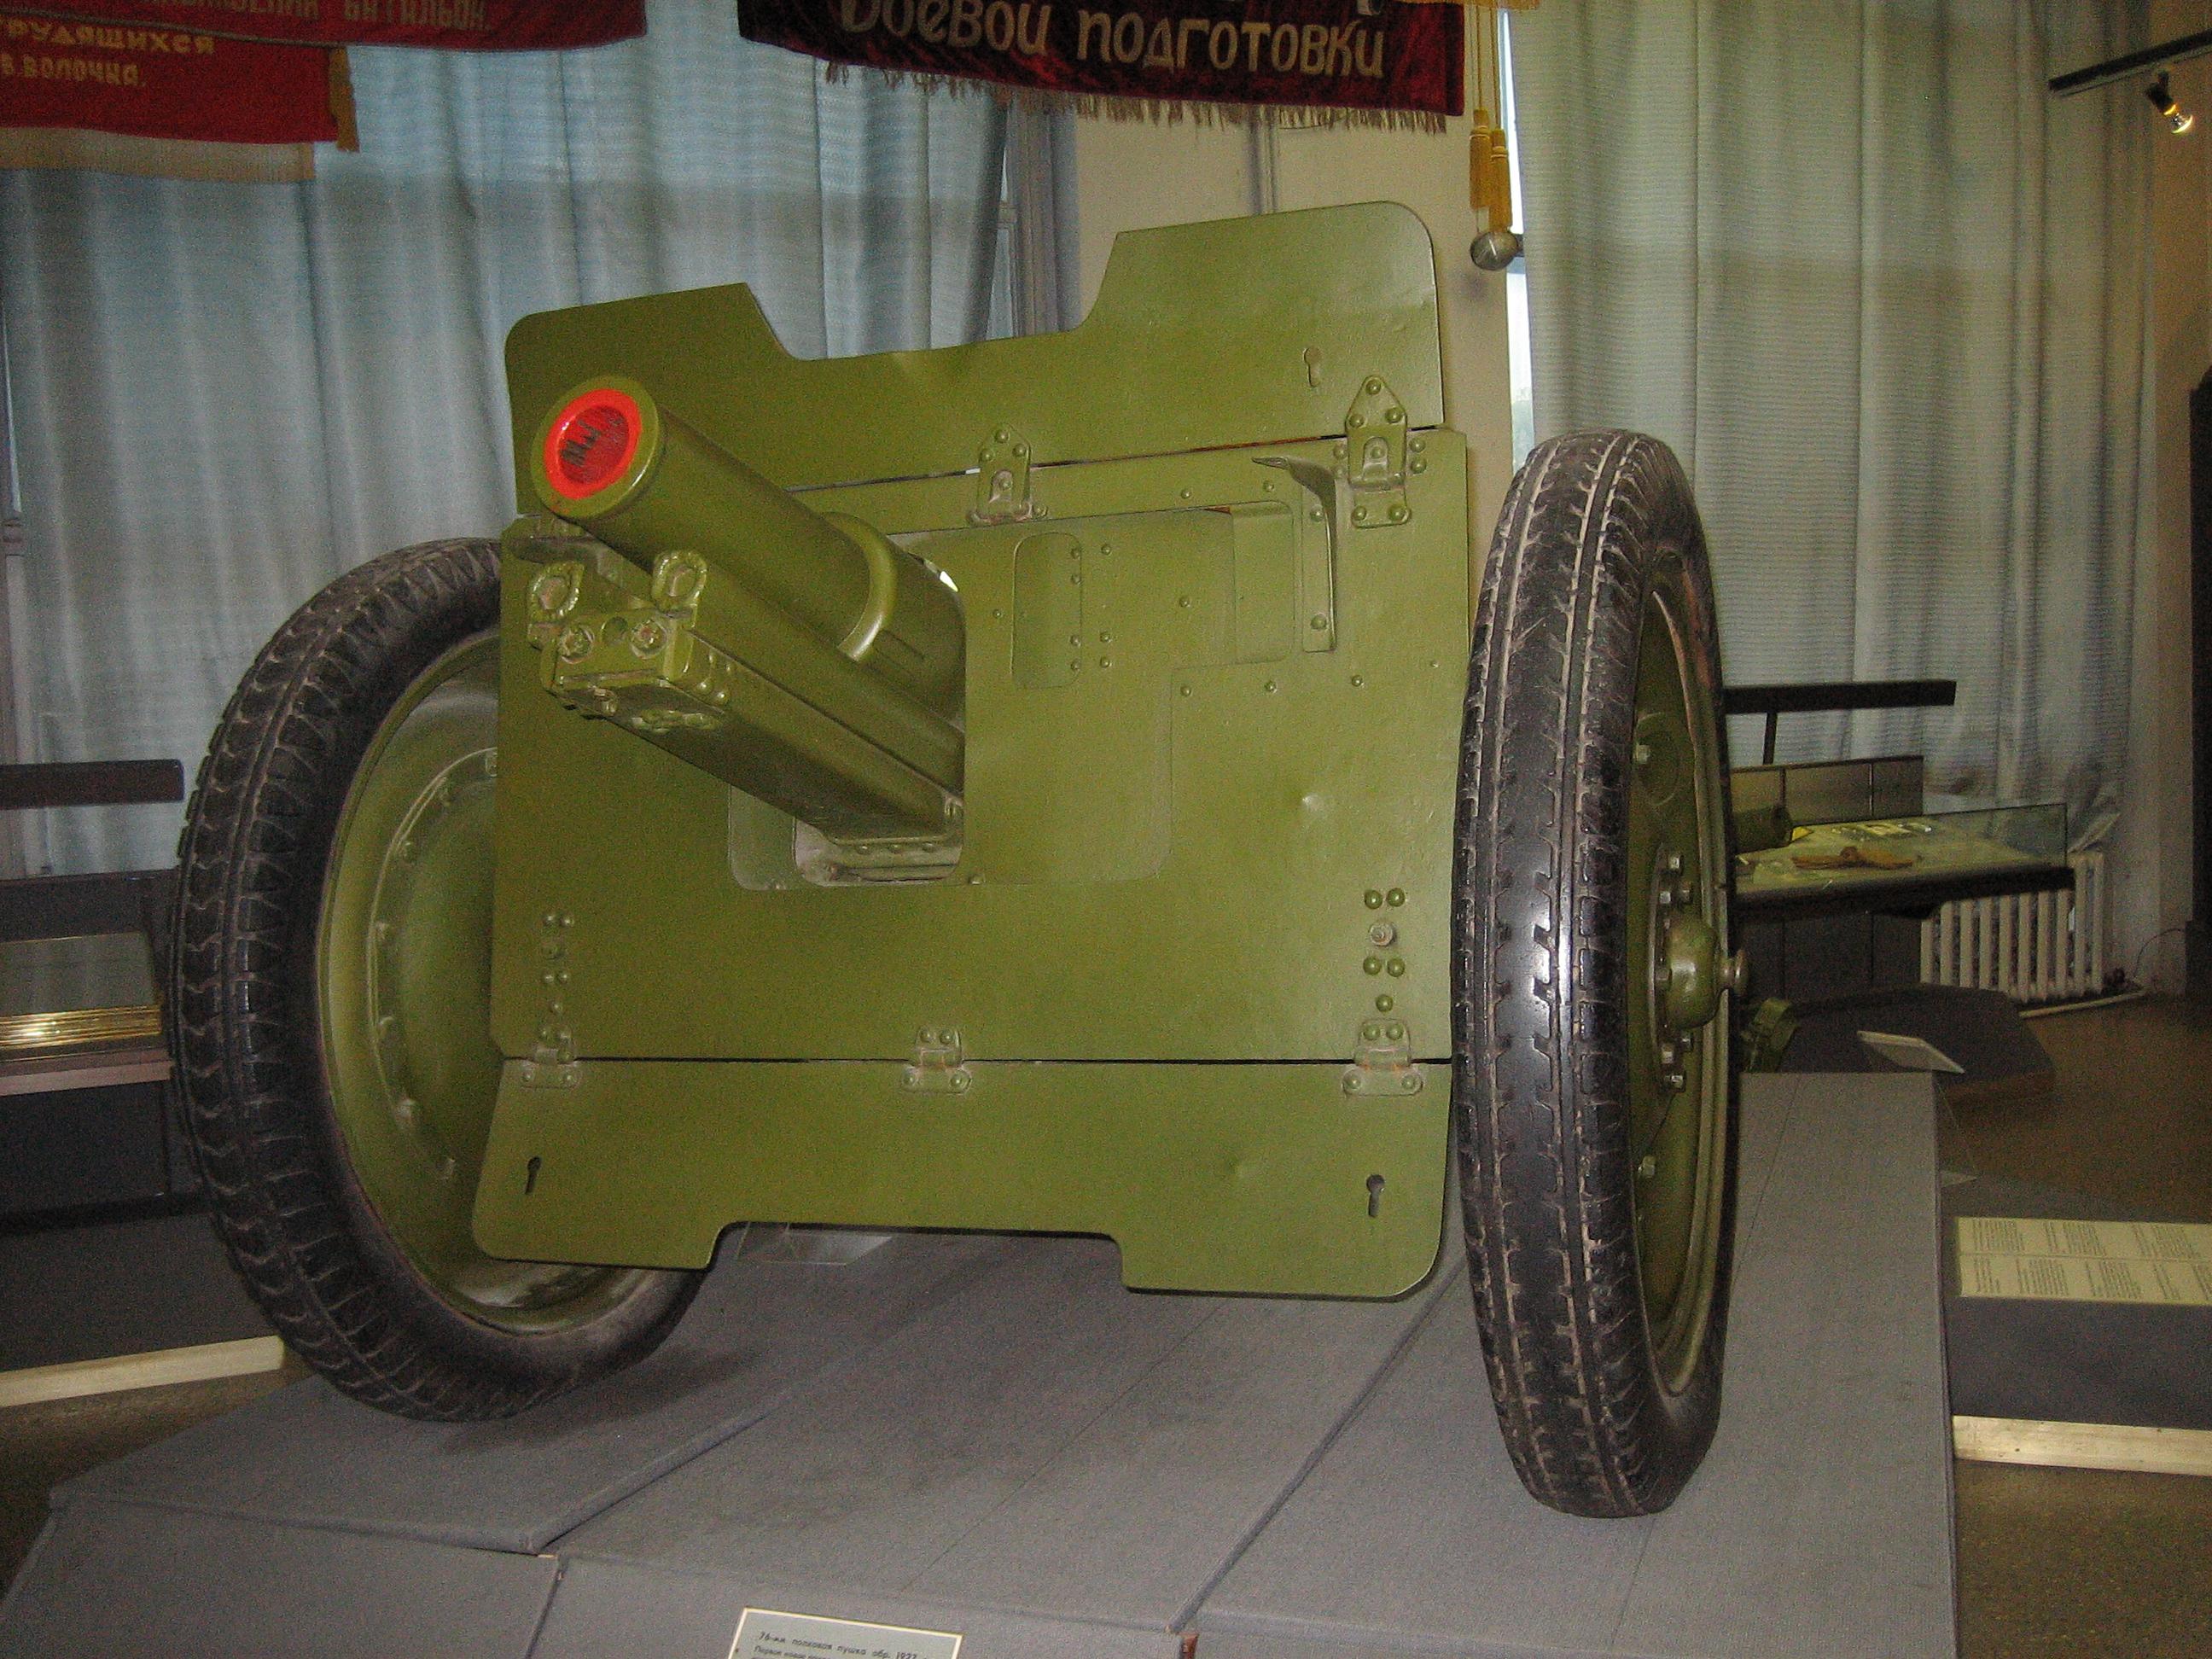 Regimental_gun_76mm_1927_Moscow_3.jpg?us